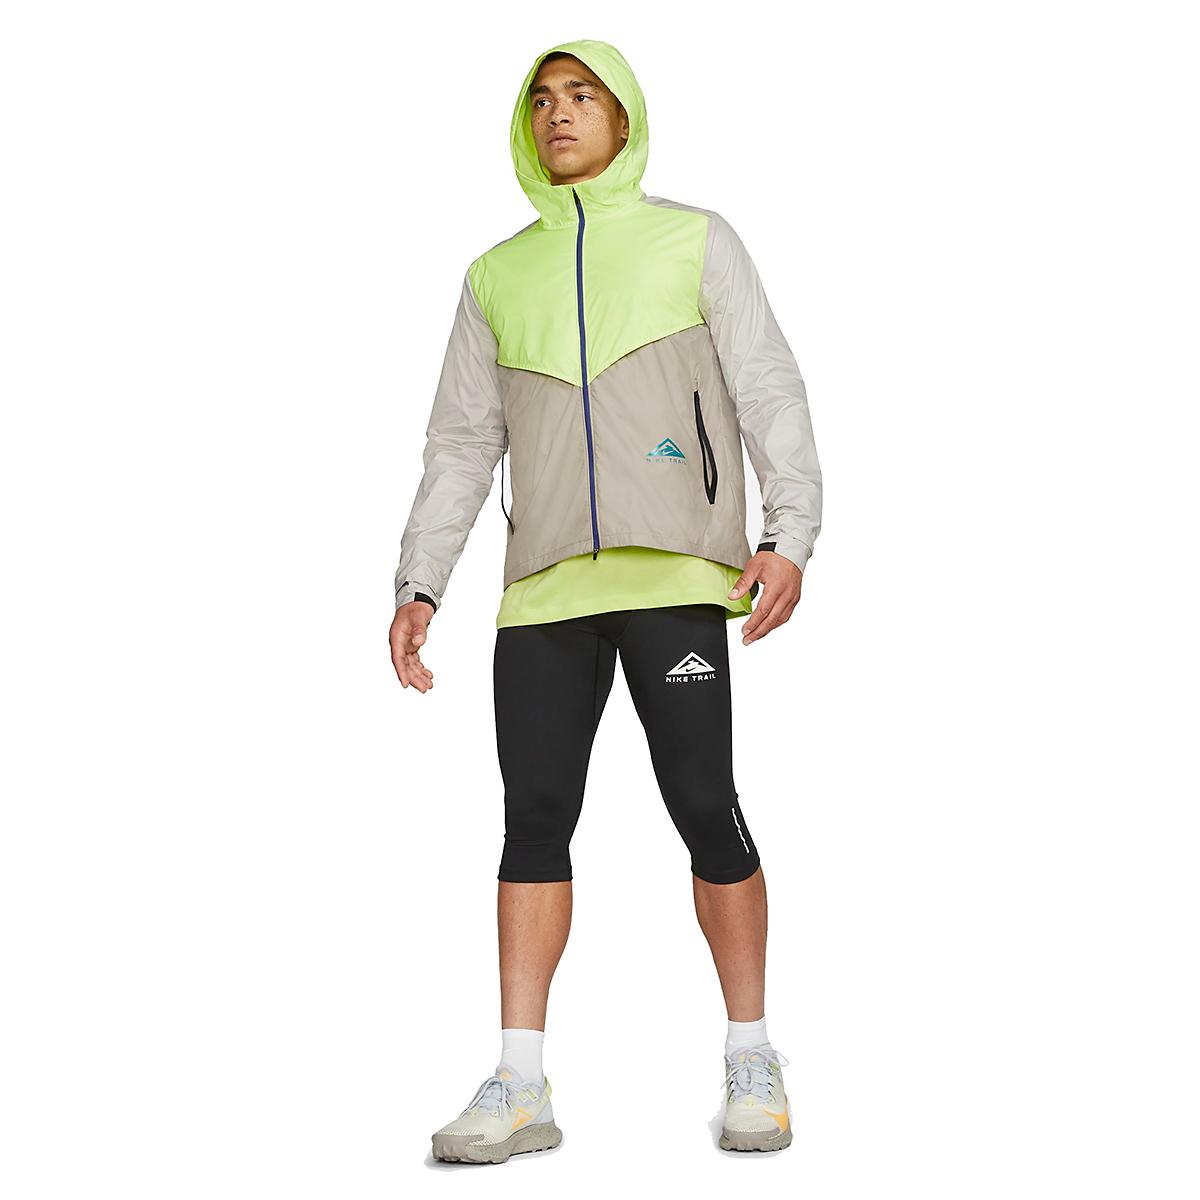 Men's Nike Windrunner Trail Running Jacket - Color: Light Lemon Twist/Moon Fossil/Bright Spruce - Size: S, Light Lemon Twist/Moon Fossil/Bright Spruce, large, image 3